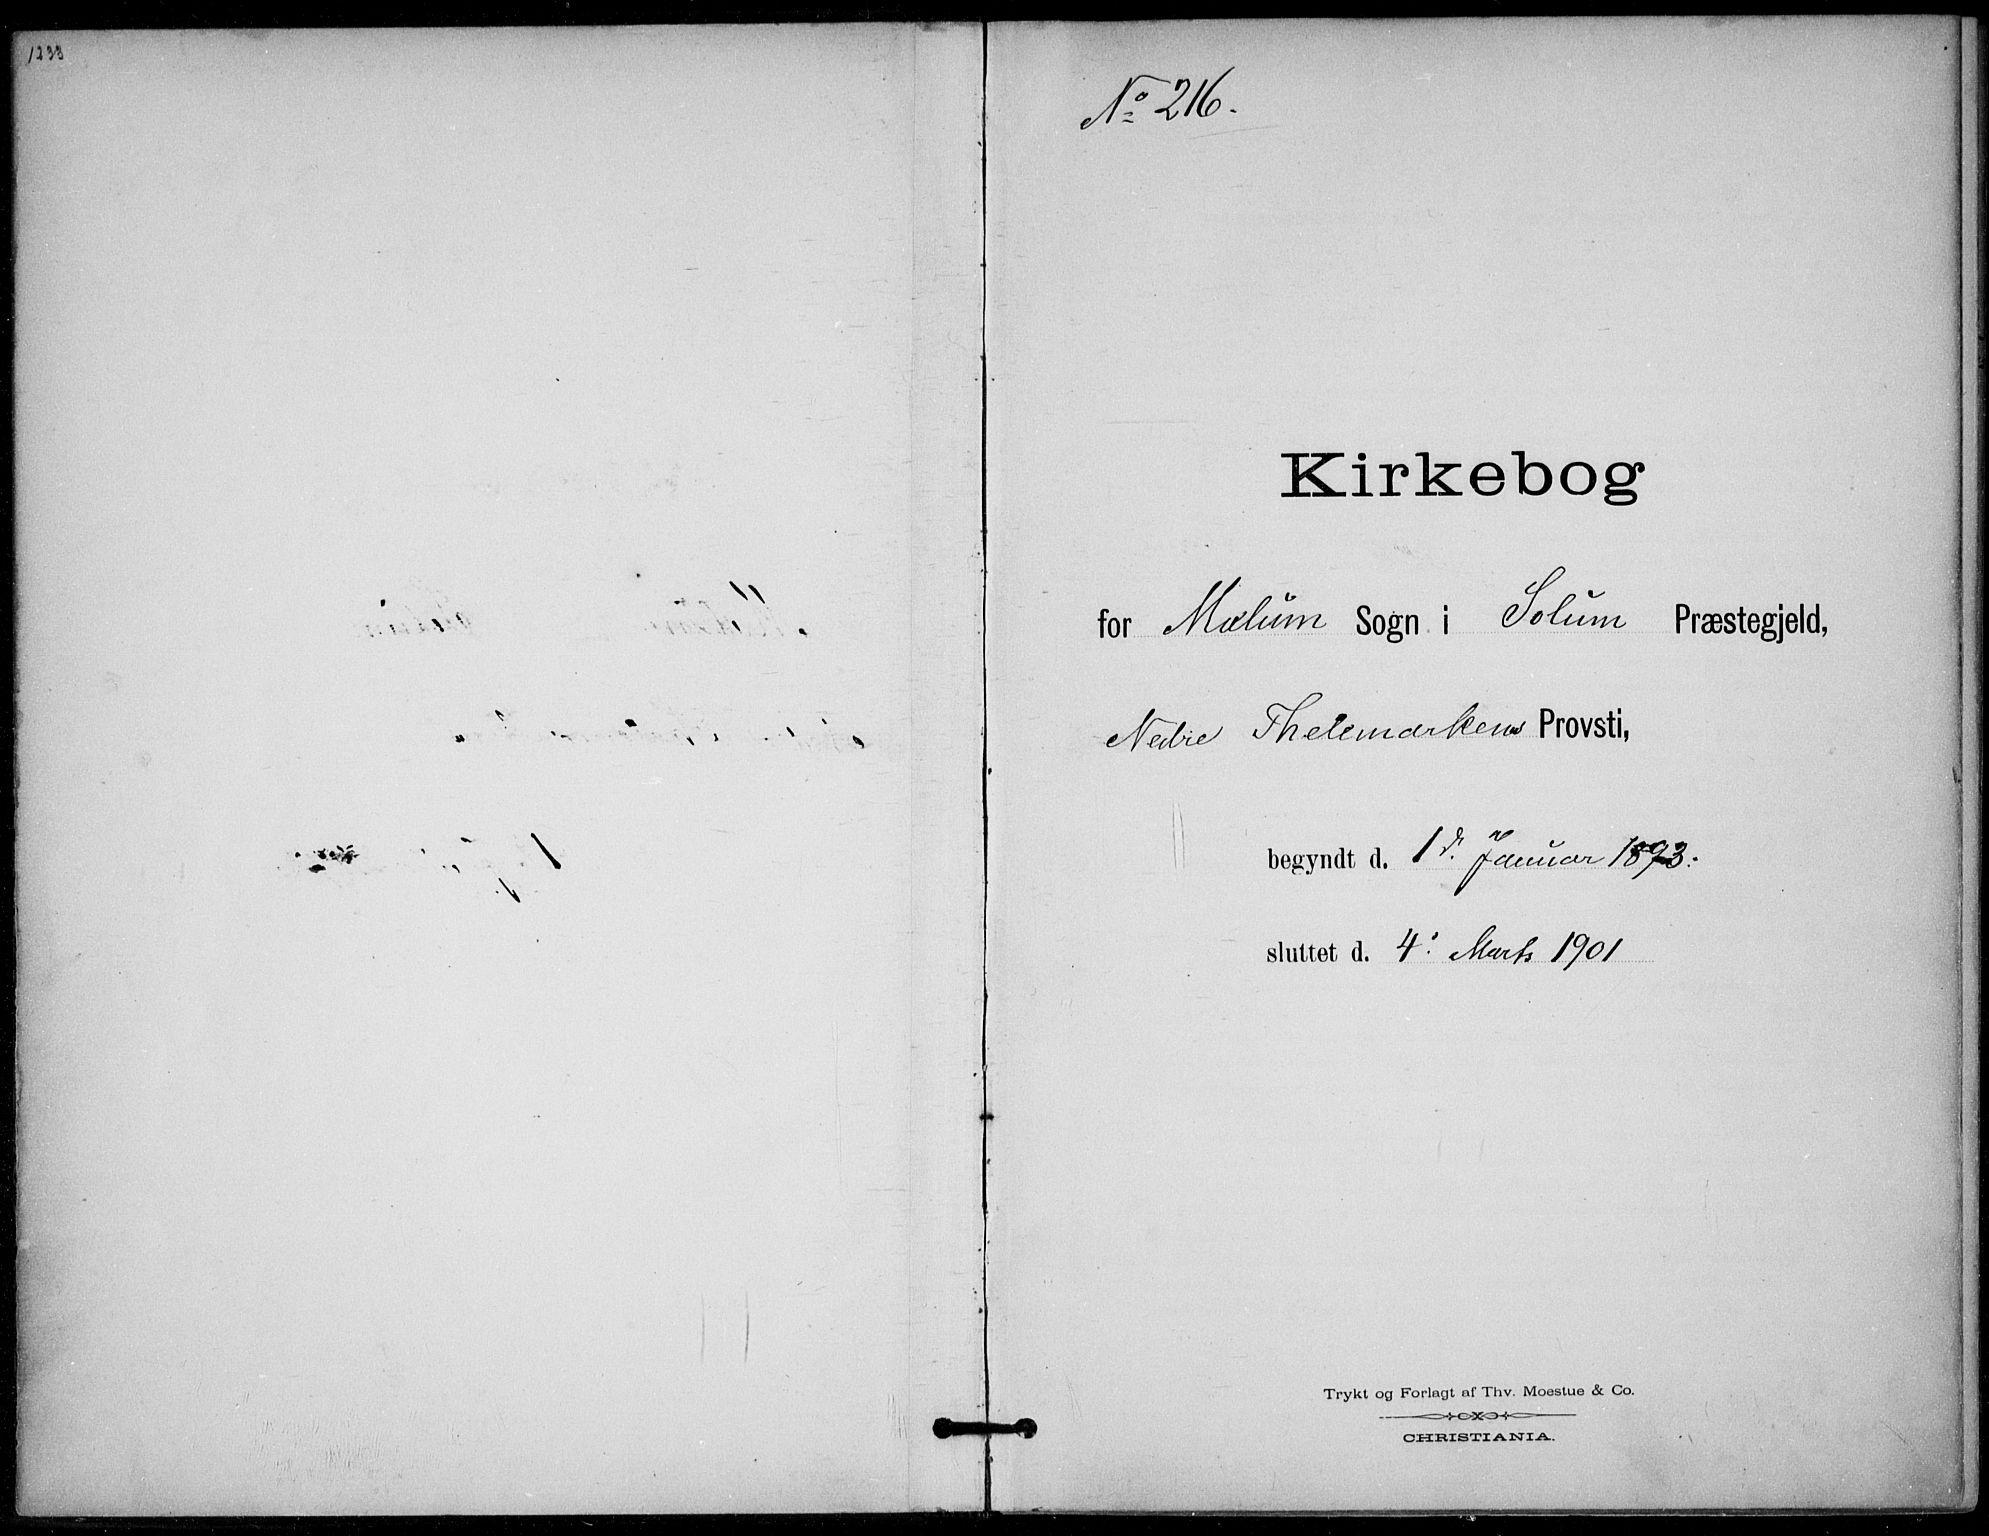 SAKO, Solum kirkebøker, F/Fb/L0002: Ministerialbok nr. II 2, 1893-1901